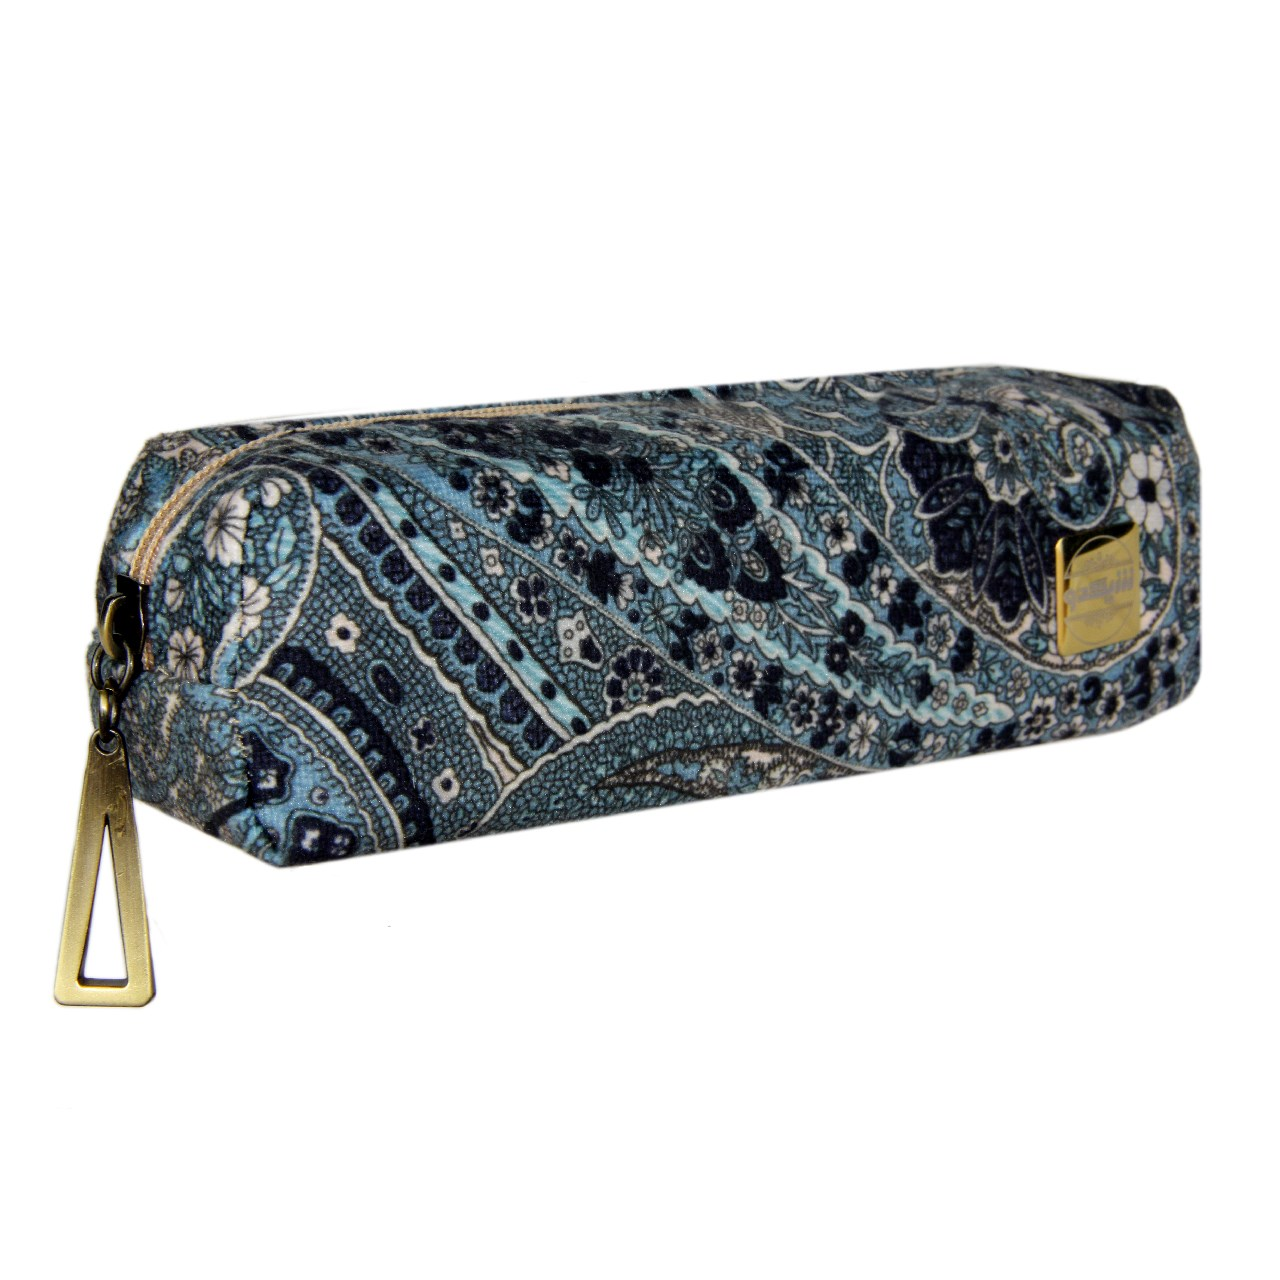 قیمت کیف کوچک لوازم آرایشی شیکدو مدل SB01